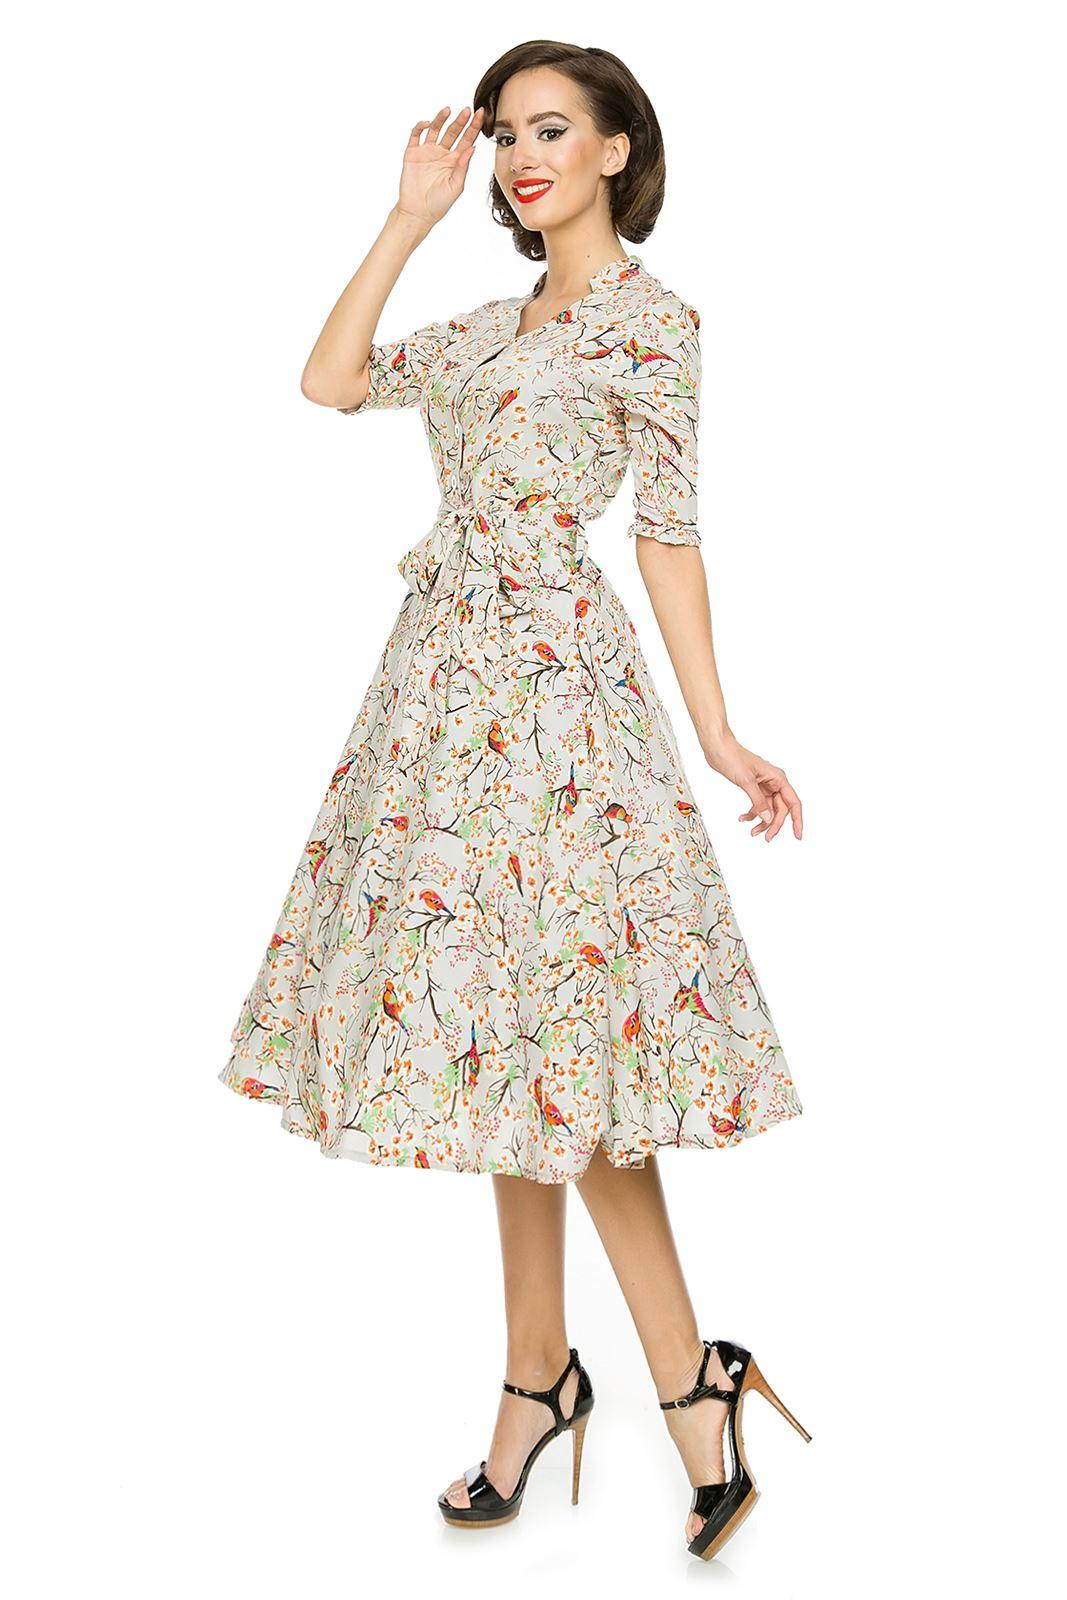 Ladies Rockabilly 1940\'s 1950\'s Retro Vintage Tea Shirt Swing Dress ...